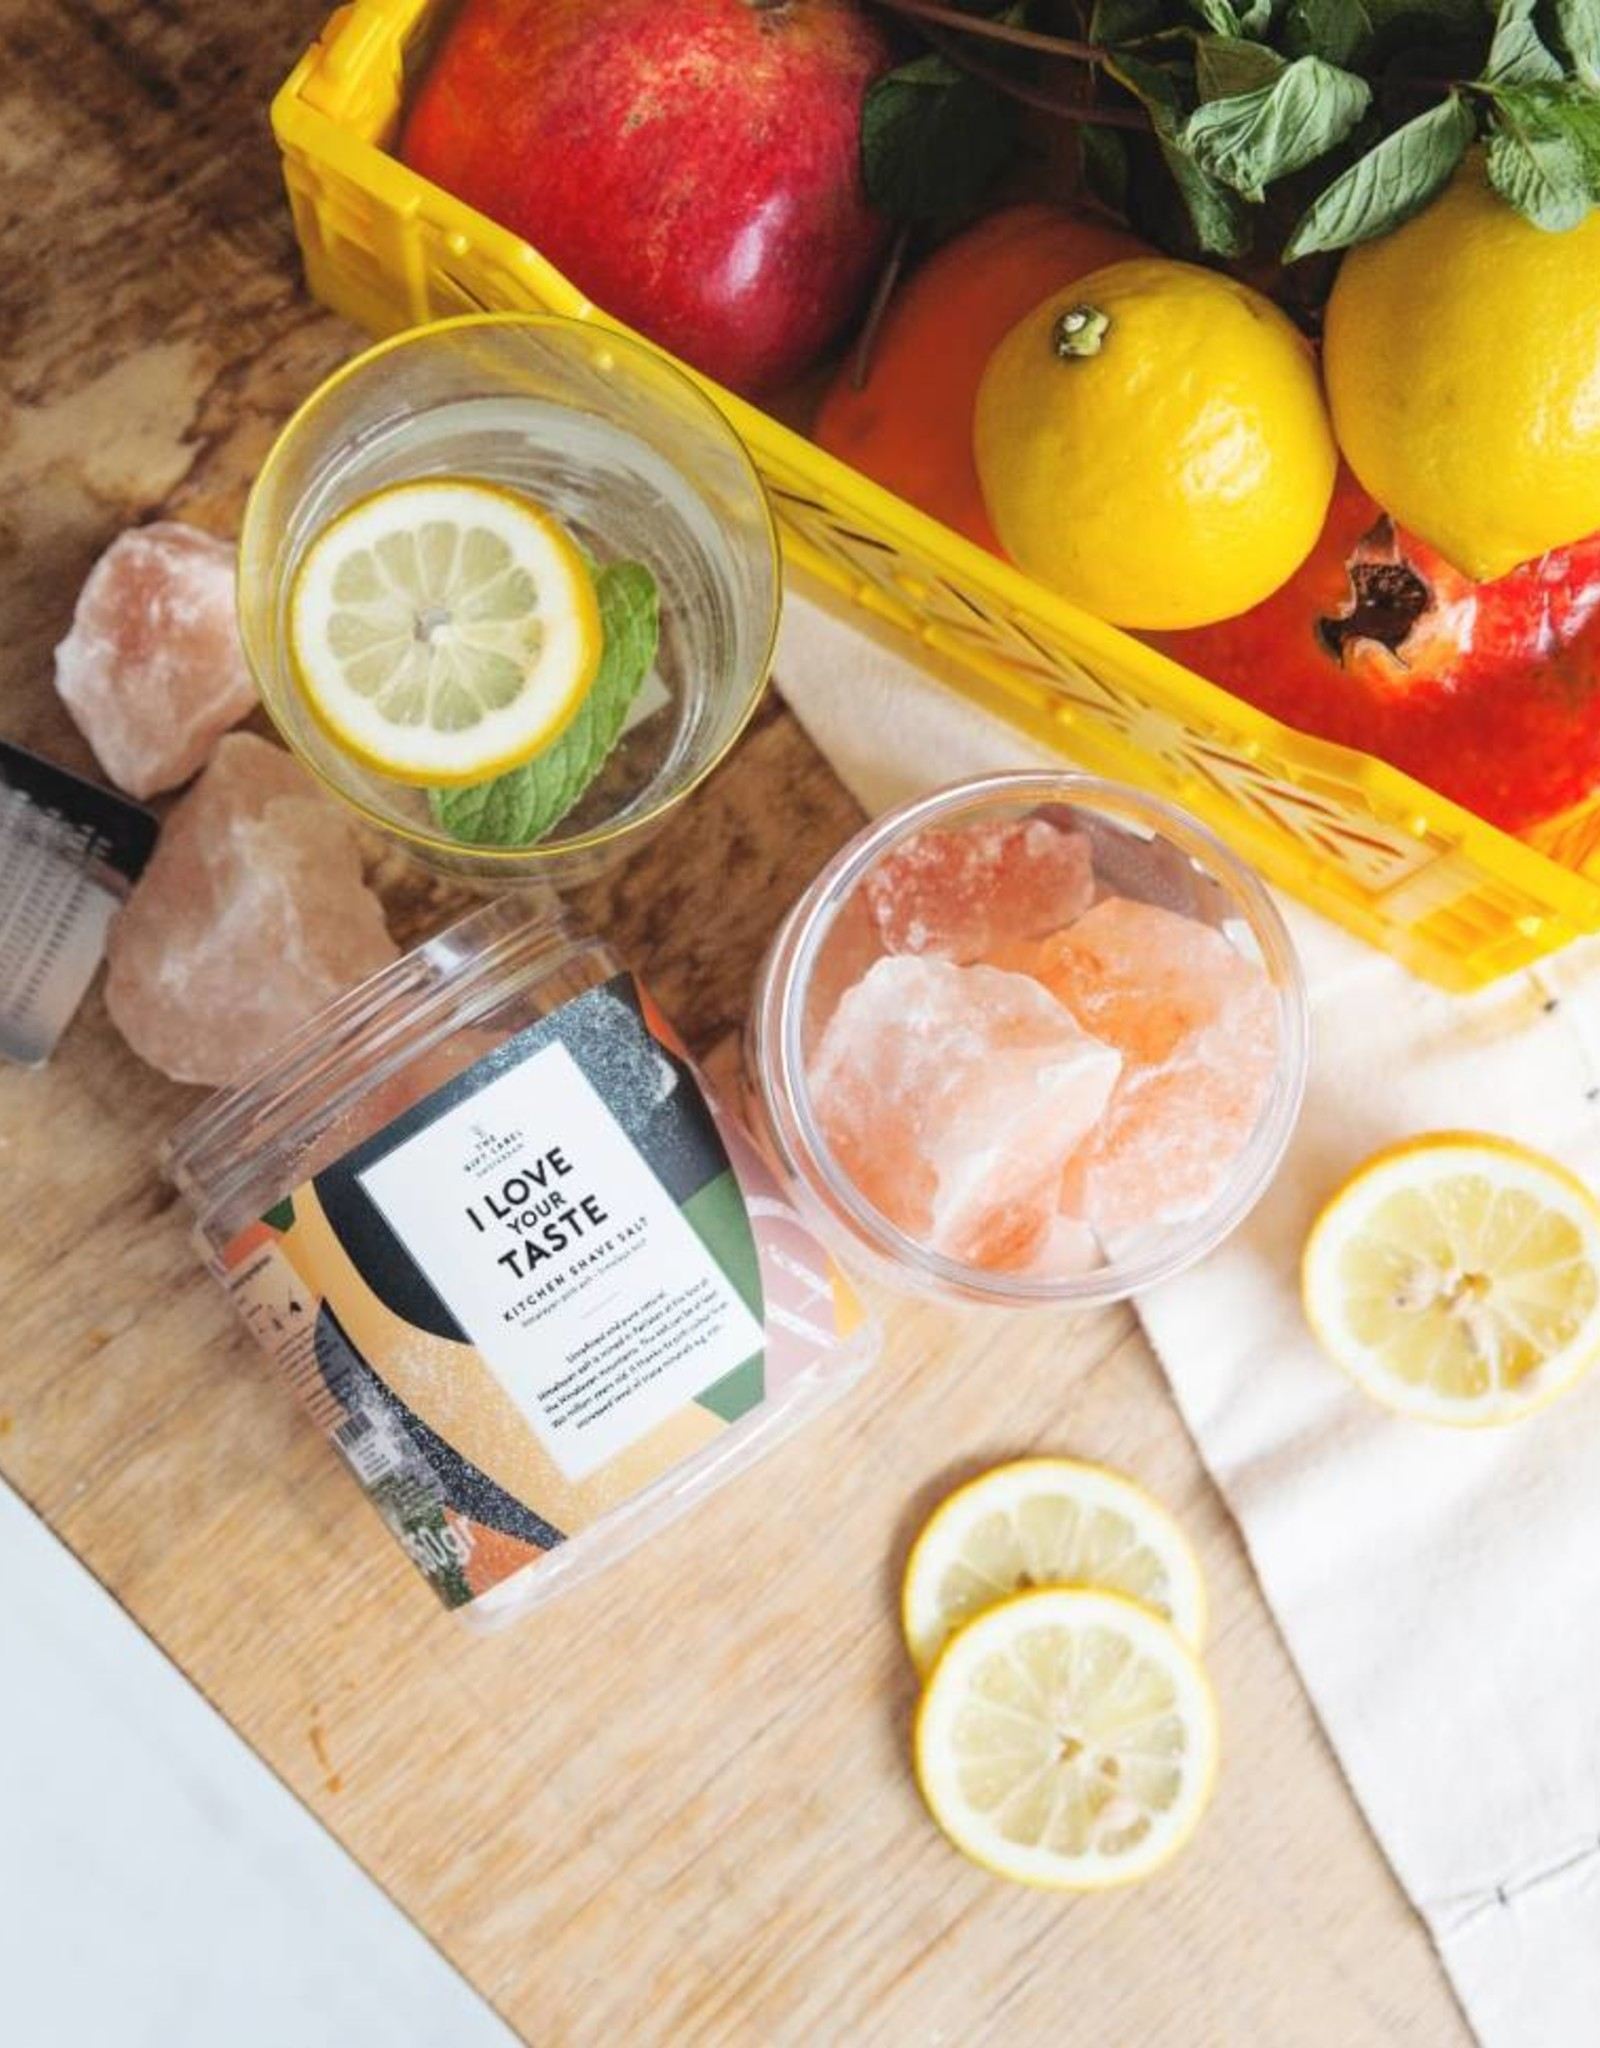 The Gift Label The Gift Label Kitchen Shave Salt I love